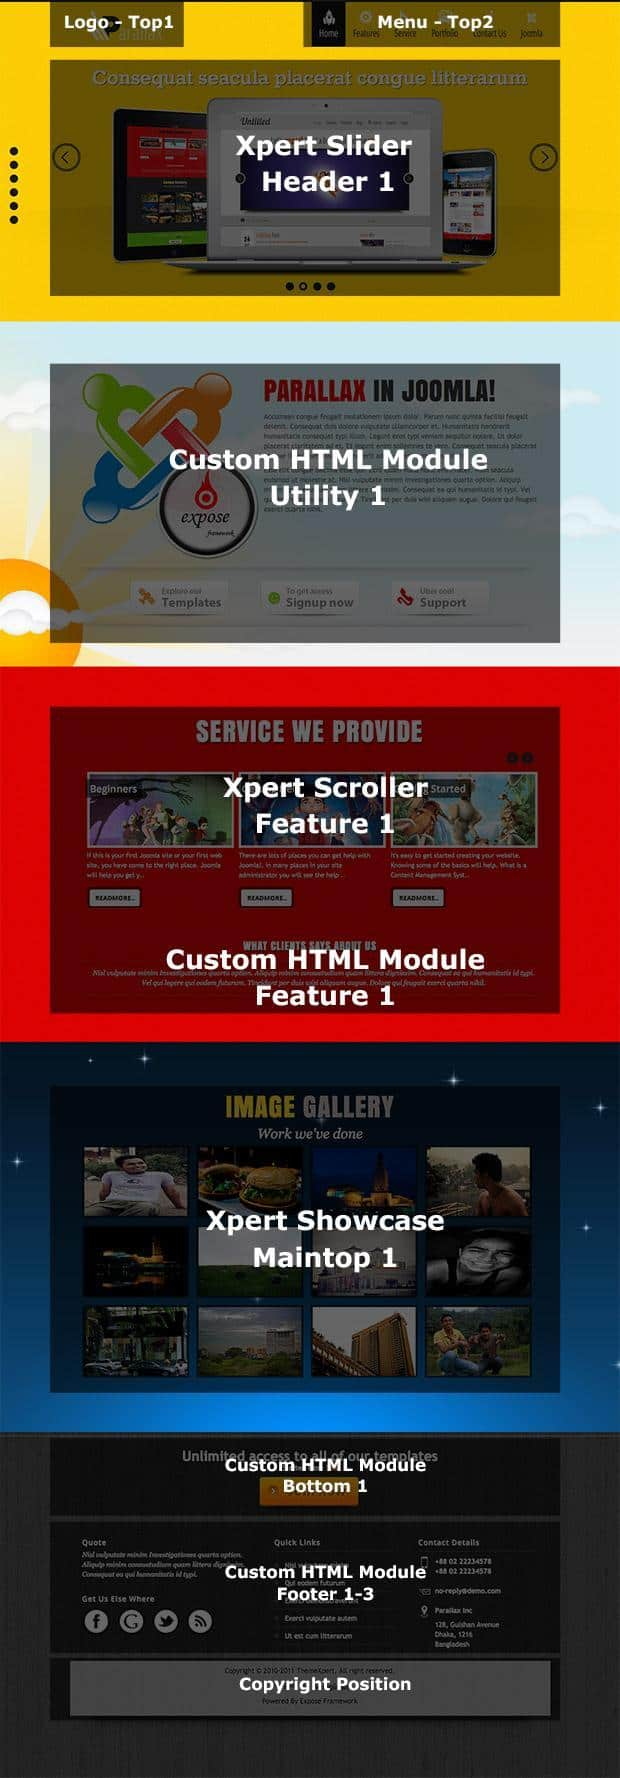 Parallax homepage